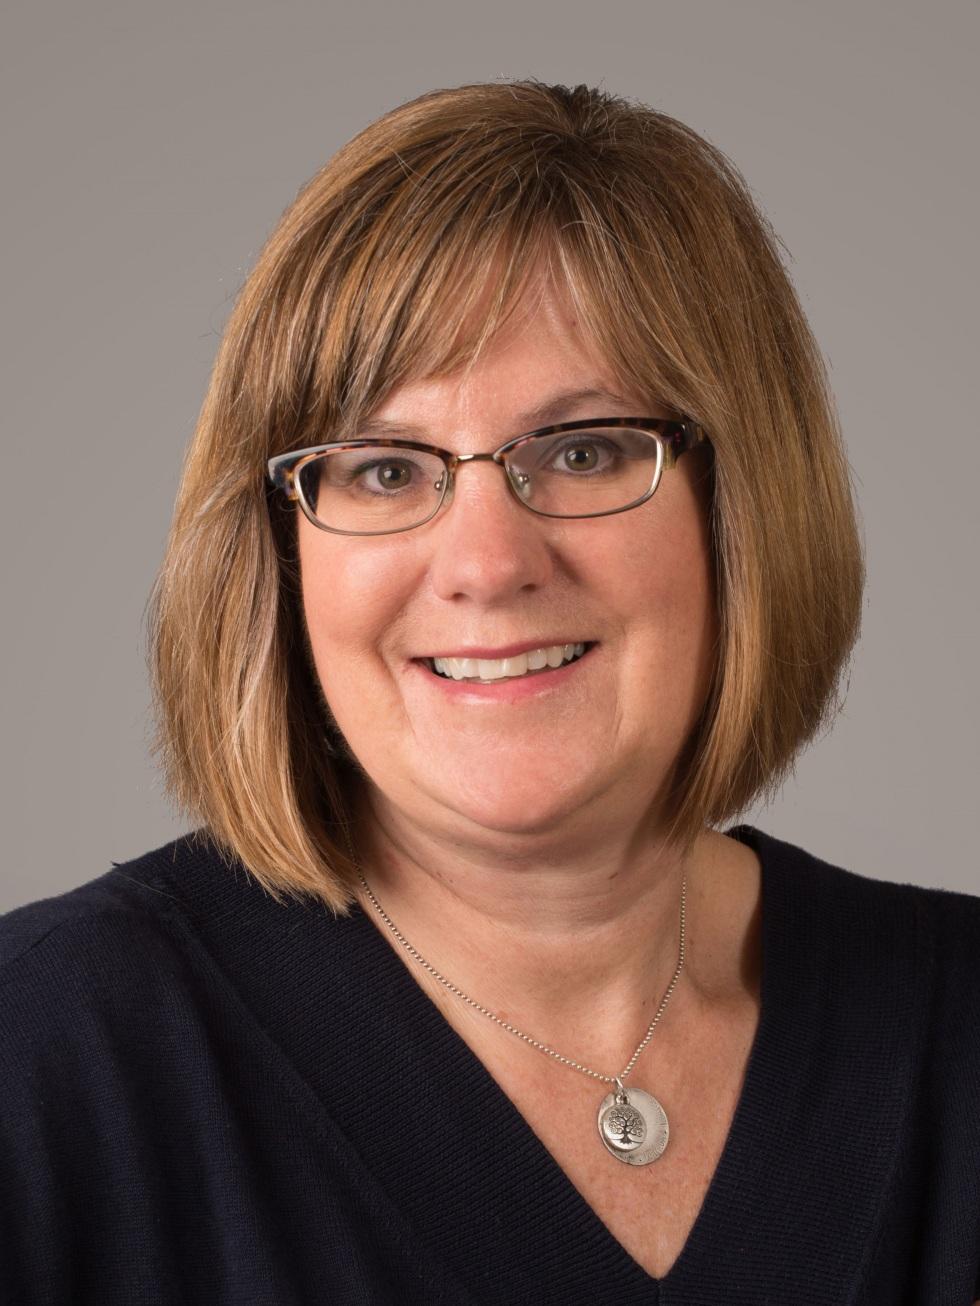 Lisa McConnell